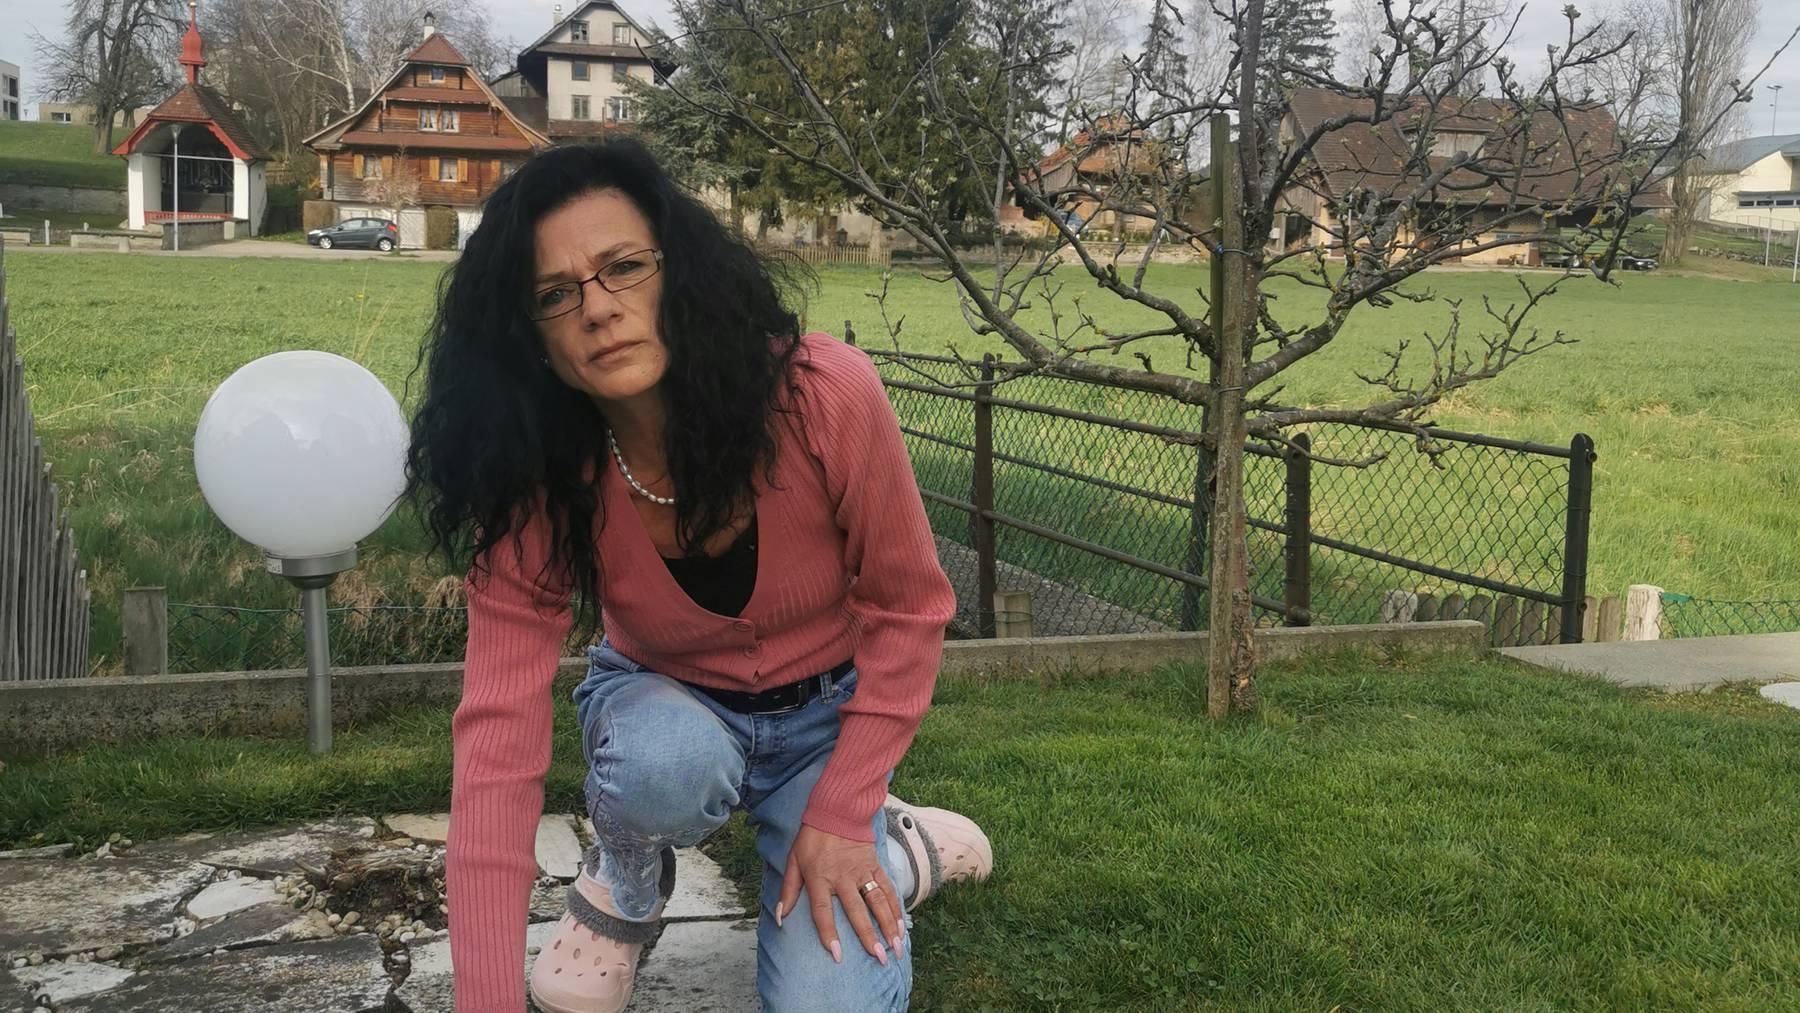 Jacqueline Odermatt aus Ettiswil